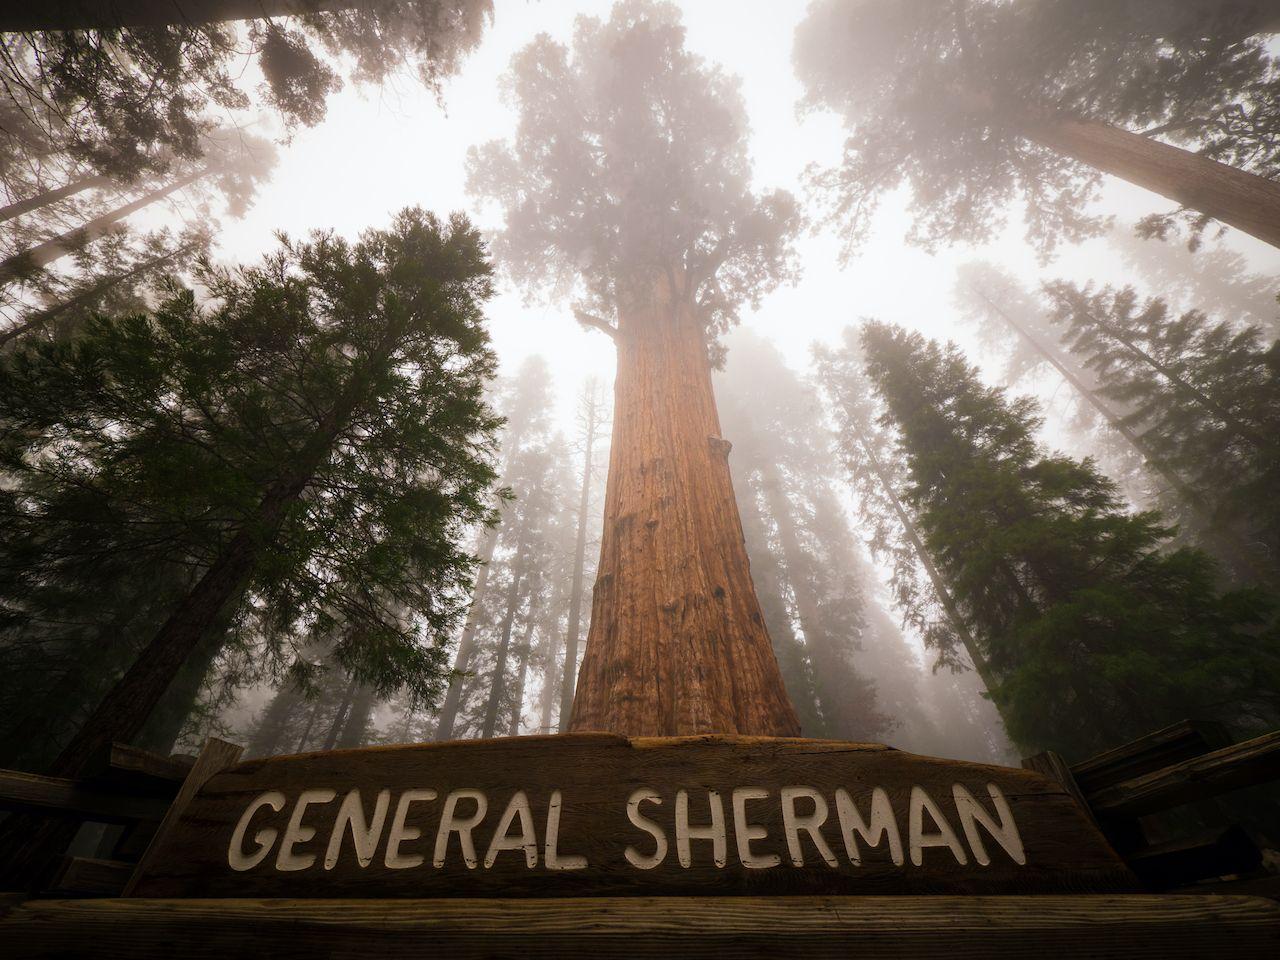 General Sherman, unique trees